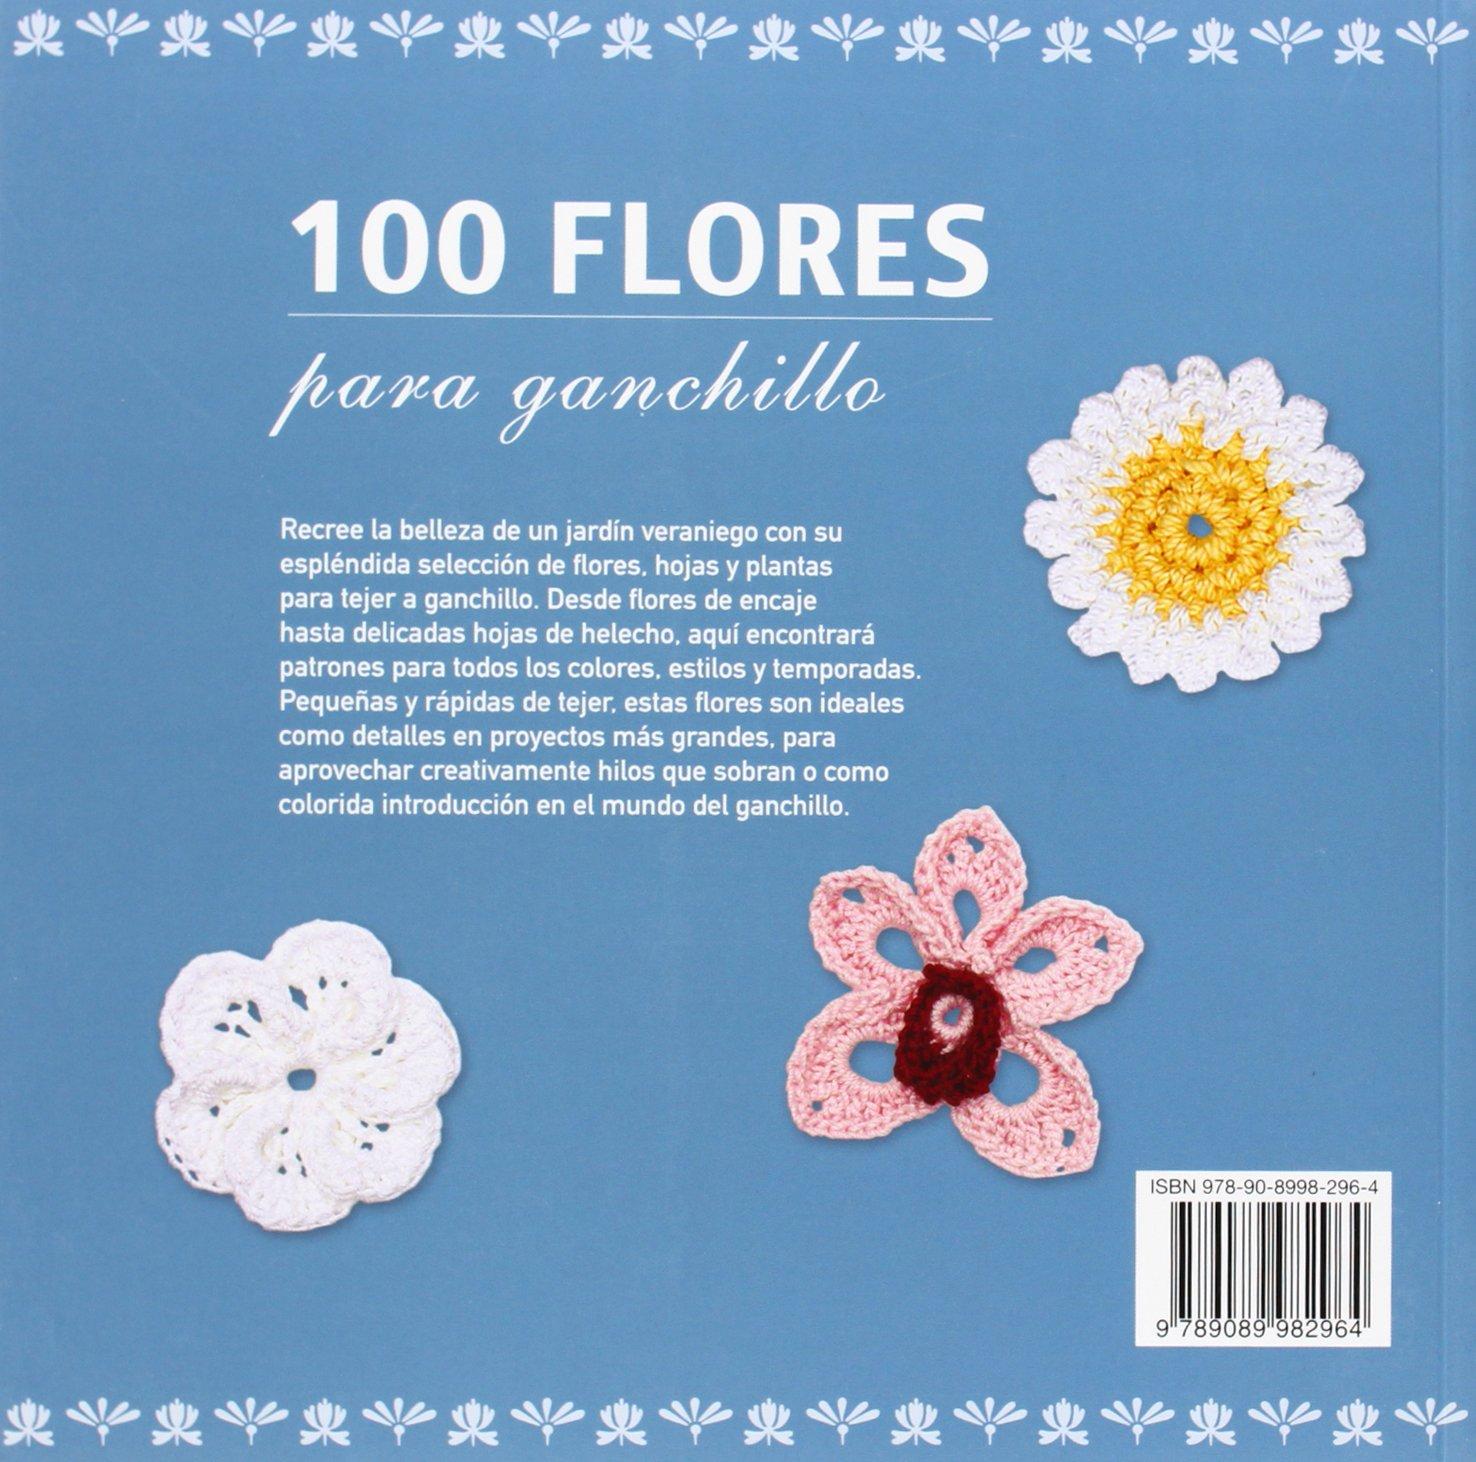 100 Flores para ganchillo: Amazon.es: Caitlin Saitnio: Libros